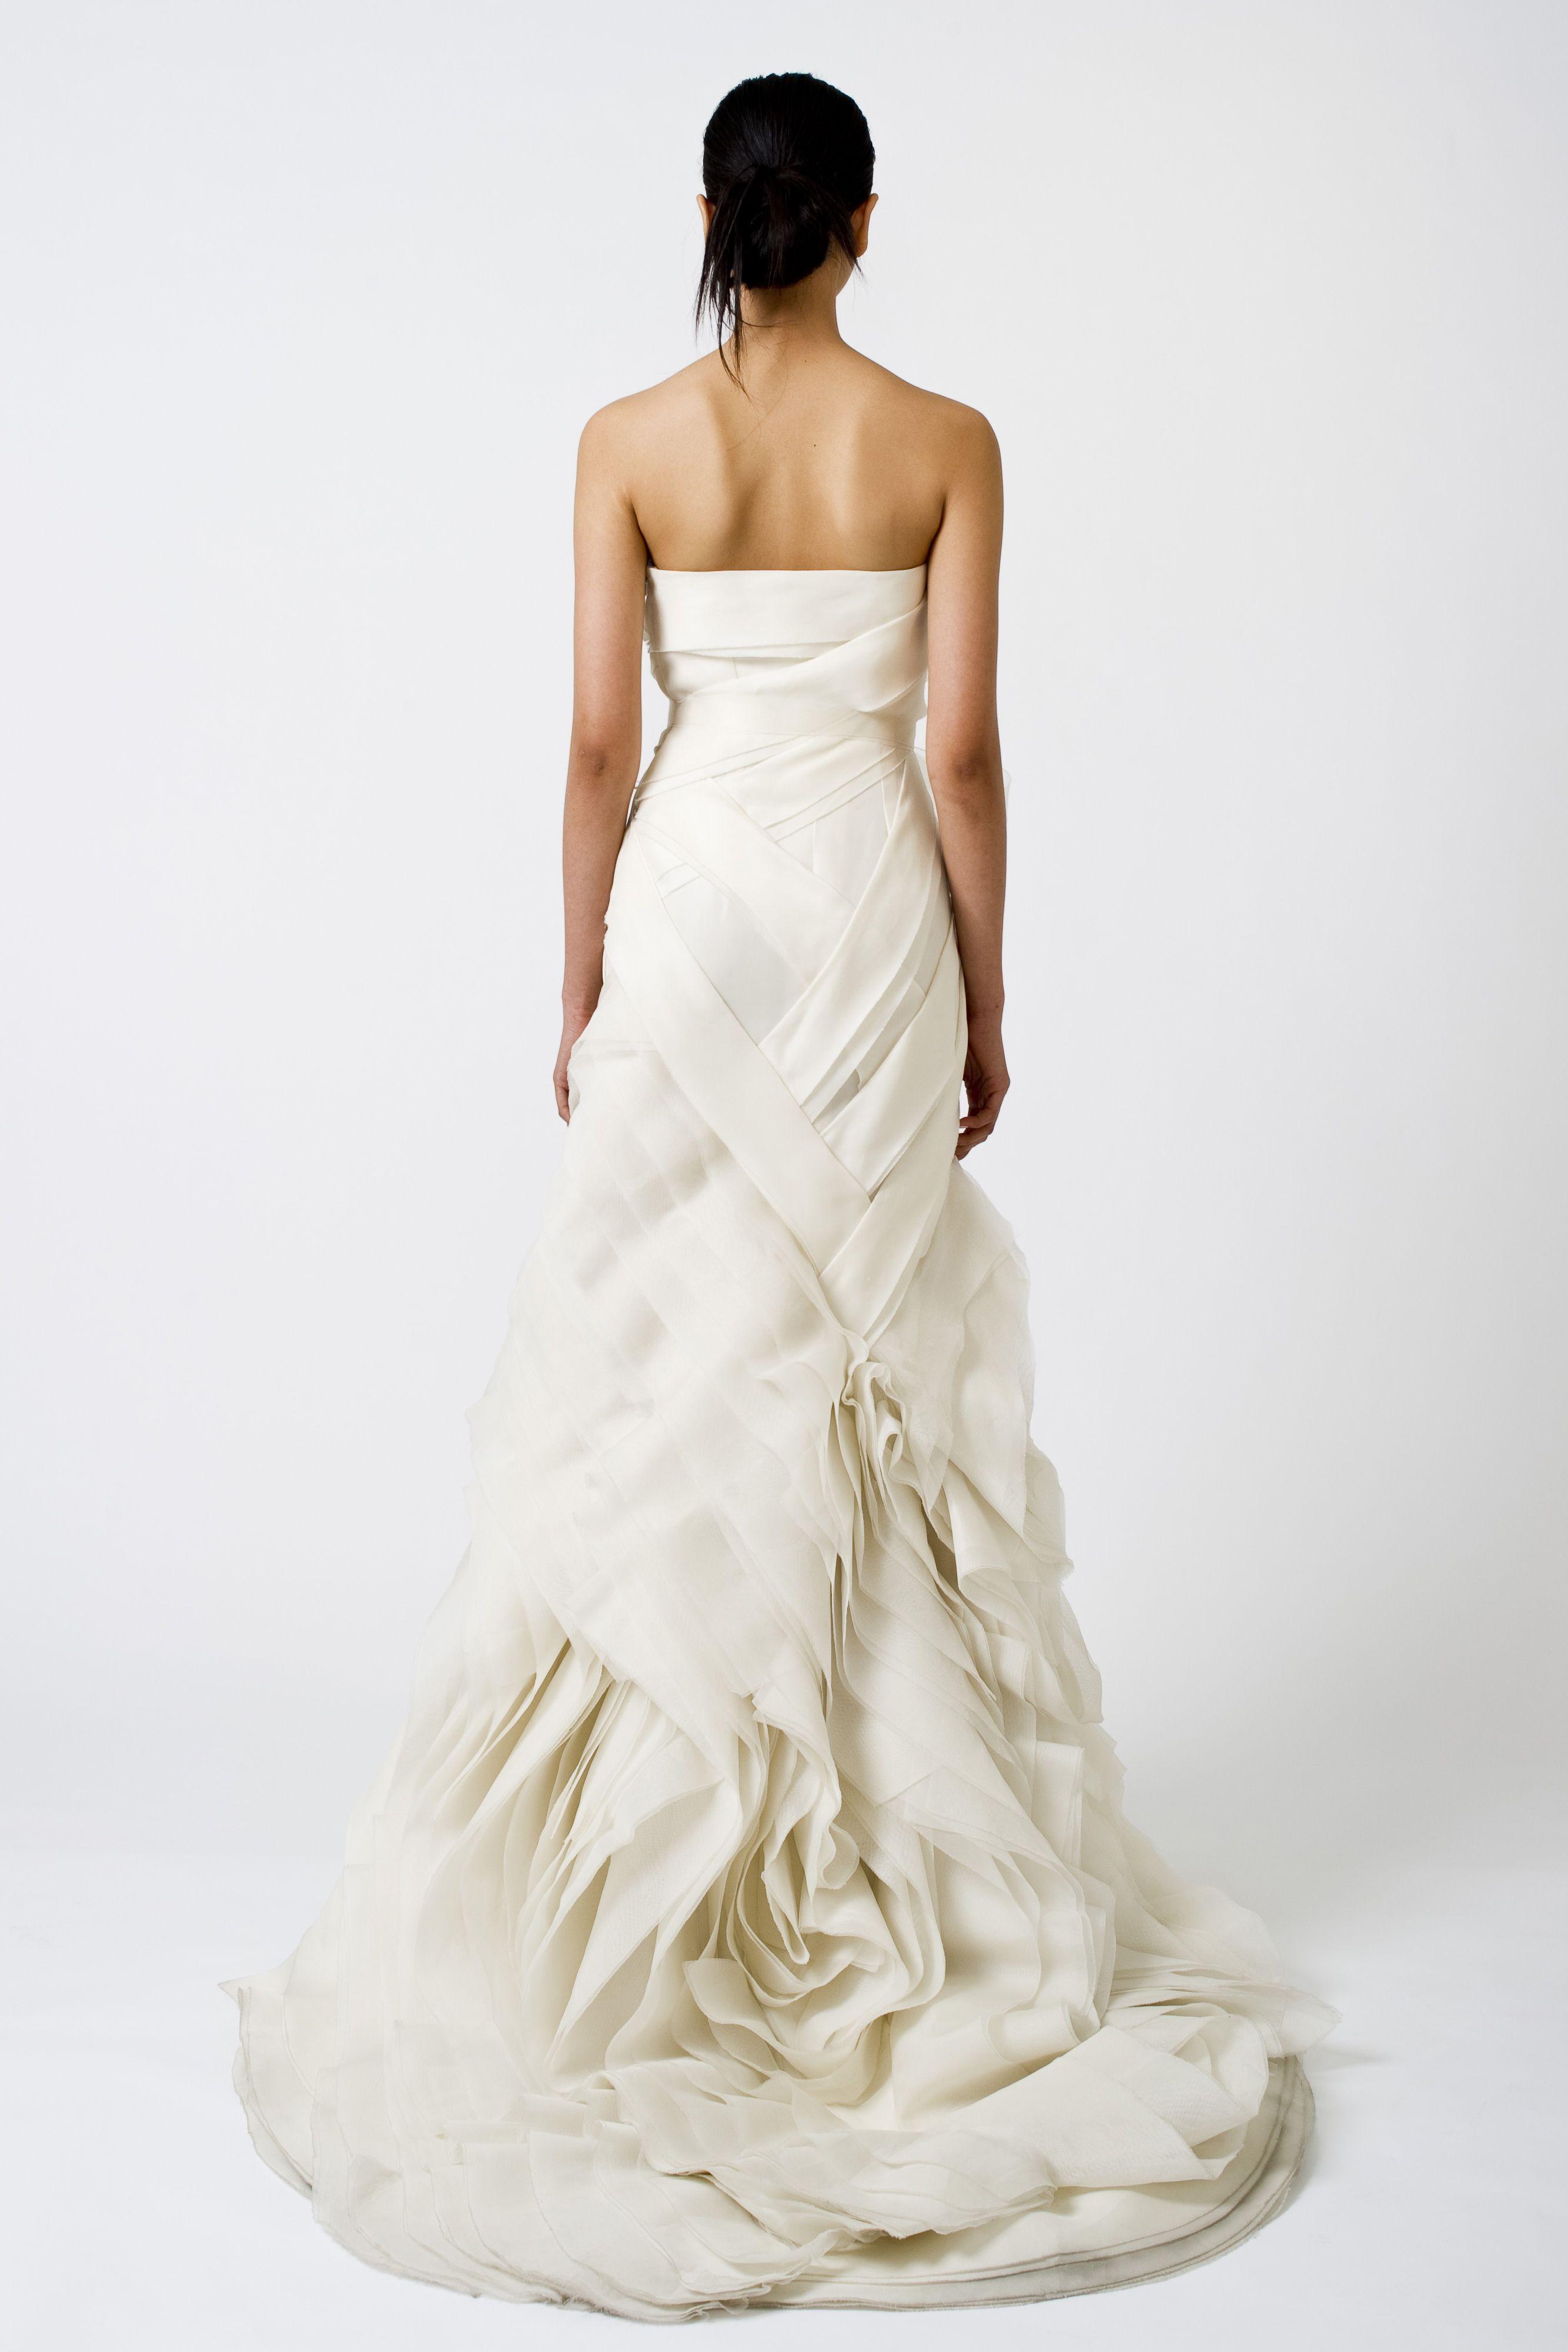 15++ Saks wedding dresses online info